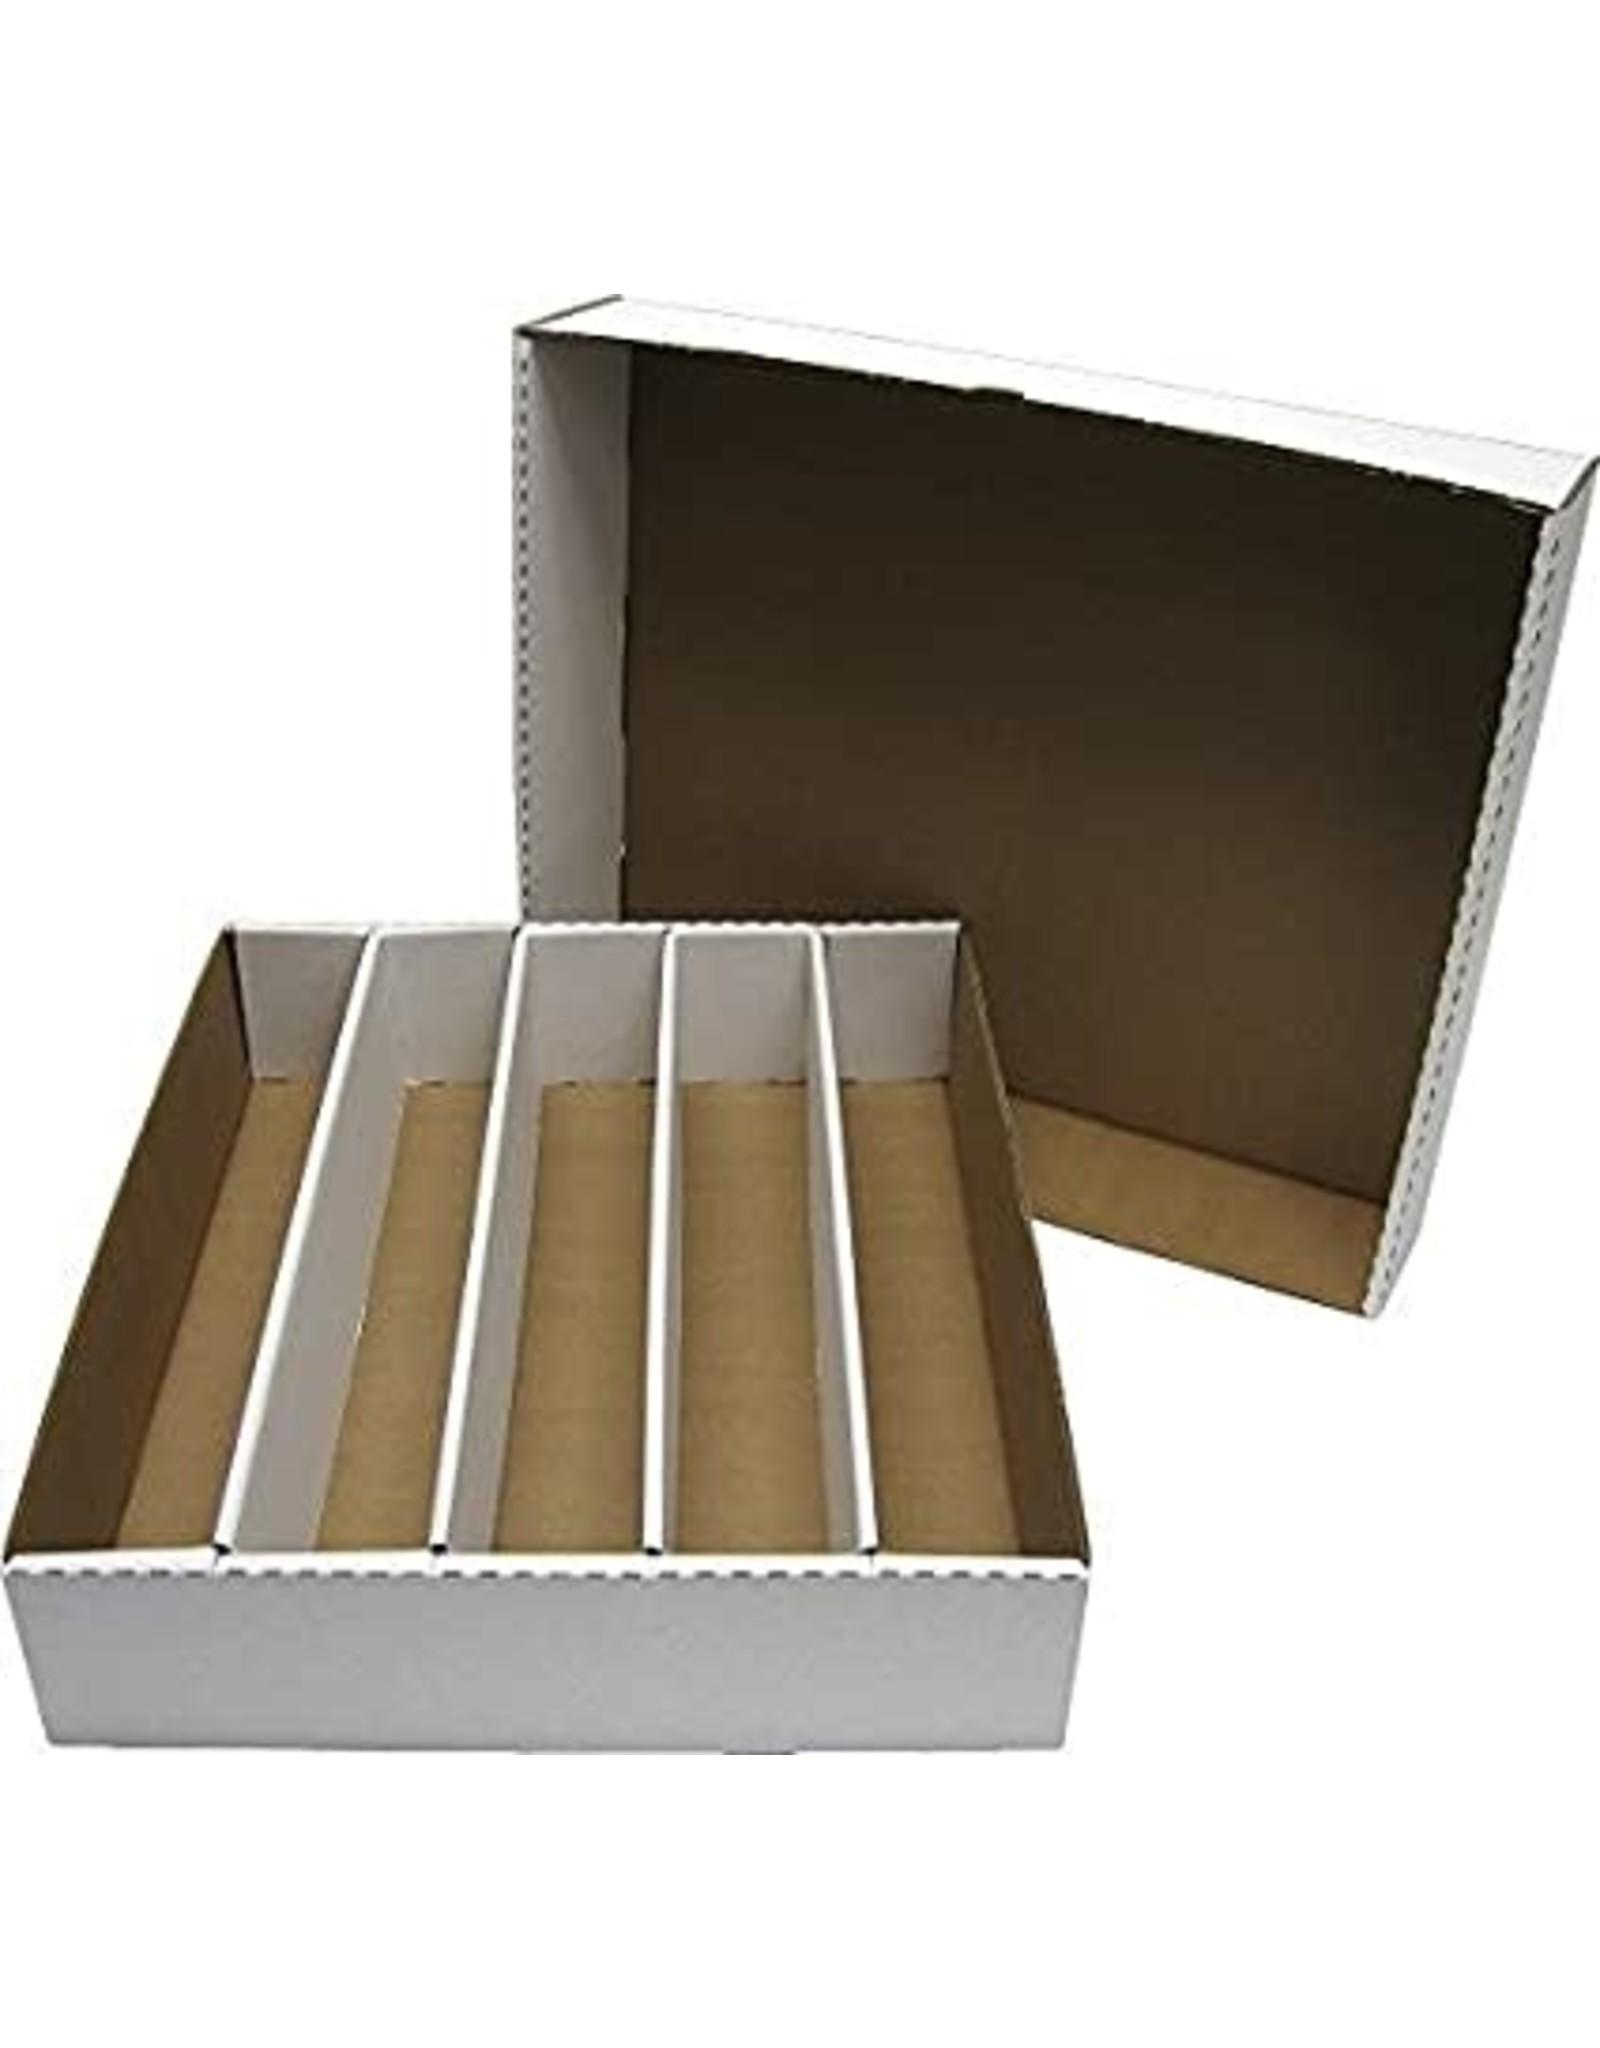 5000ct Cardboard Box